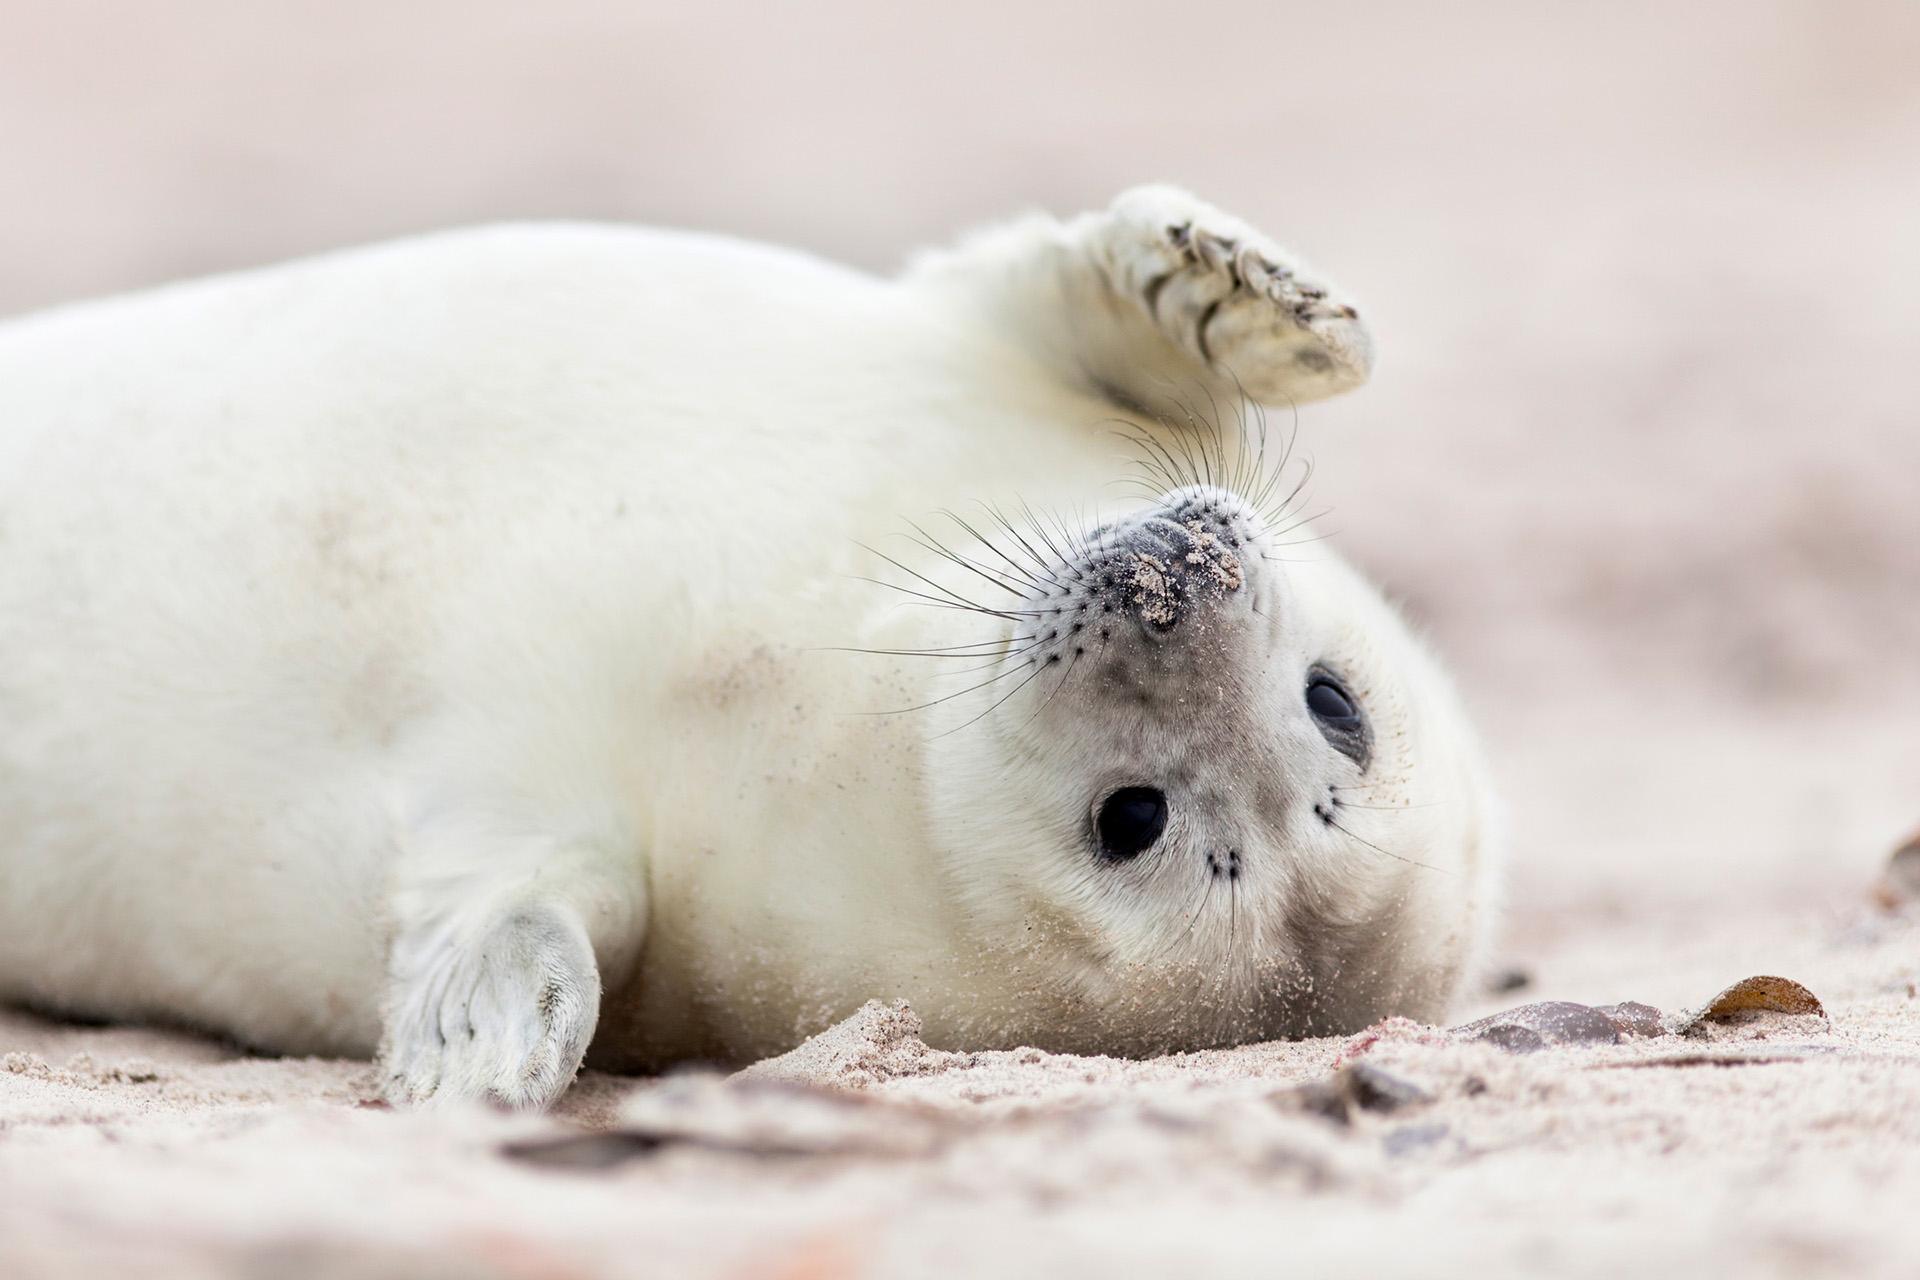 cute baby seal on the beach